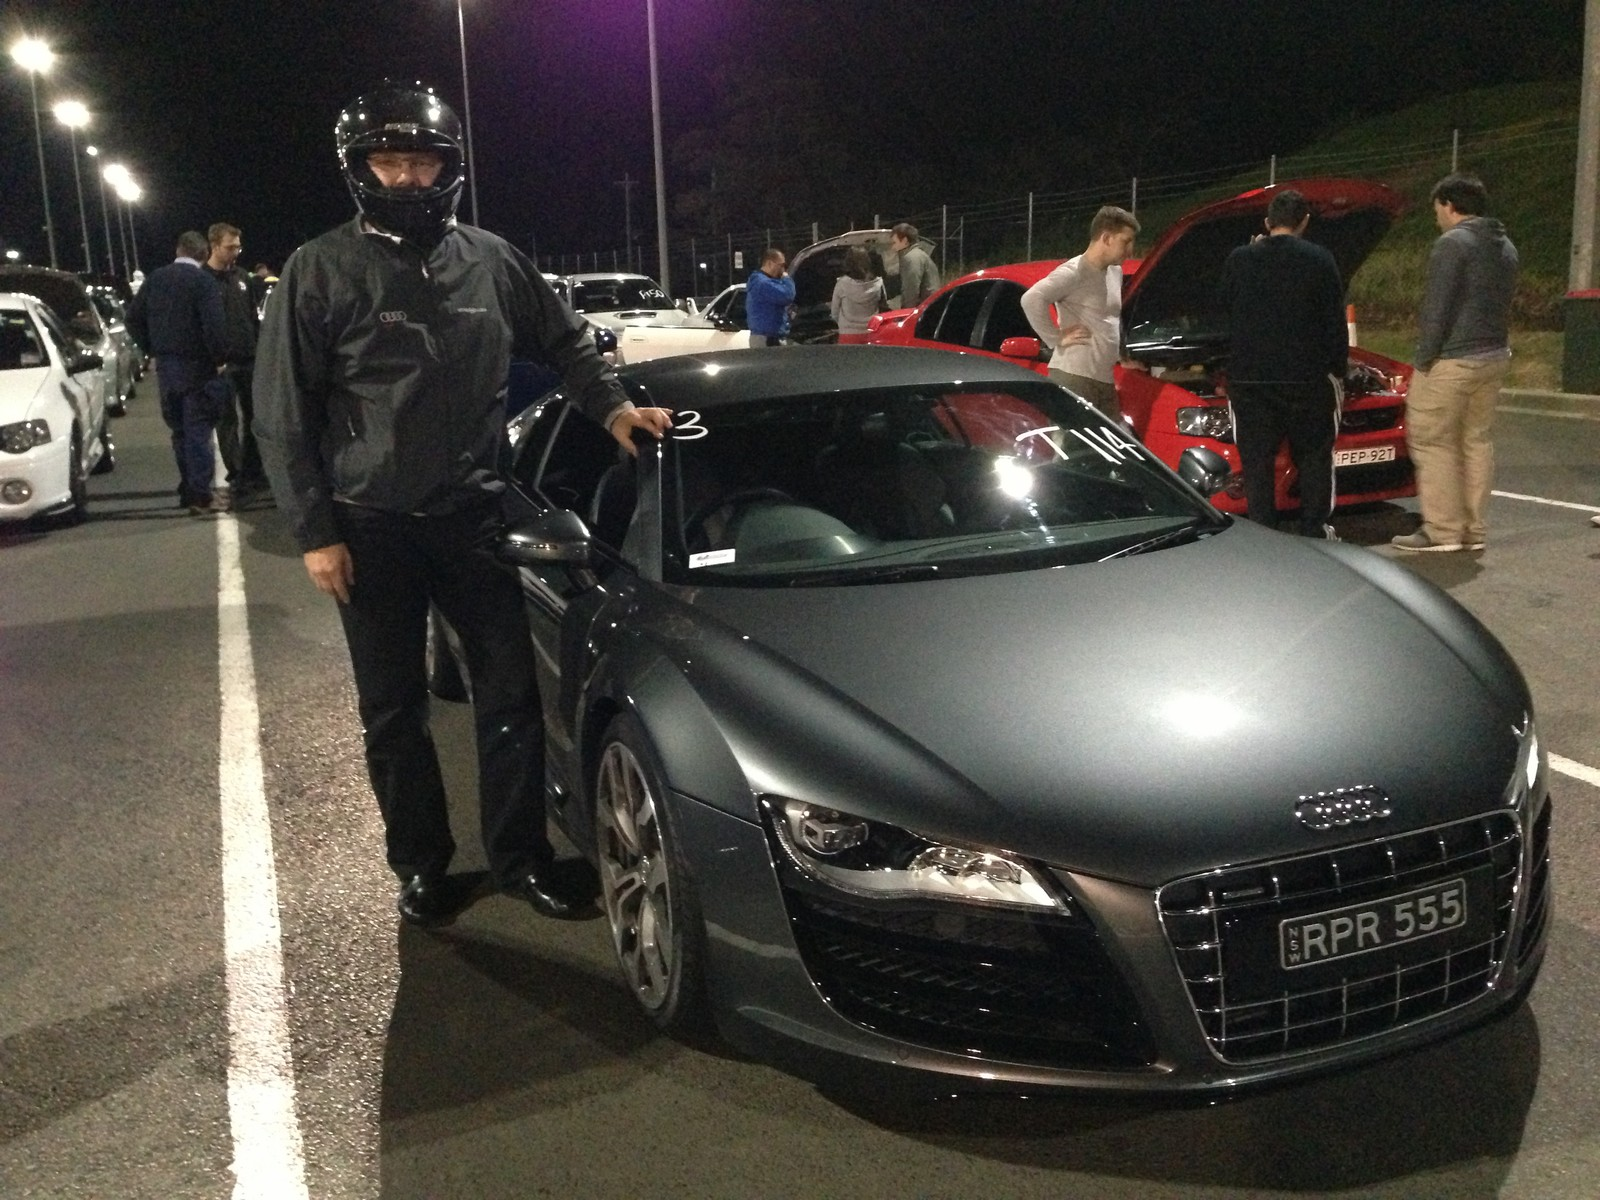 2010 Daytona Grey Audi R8 V10 FSI Pictures, Mods, Upgrades, Wallpaper ...